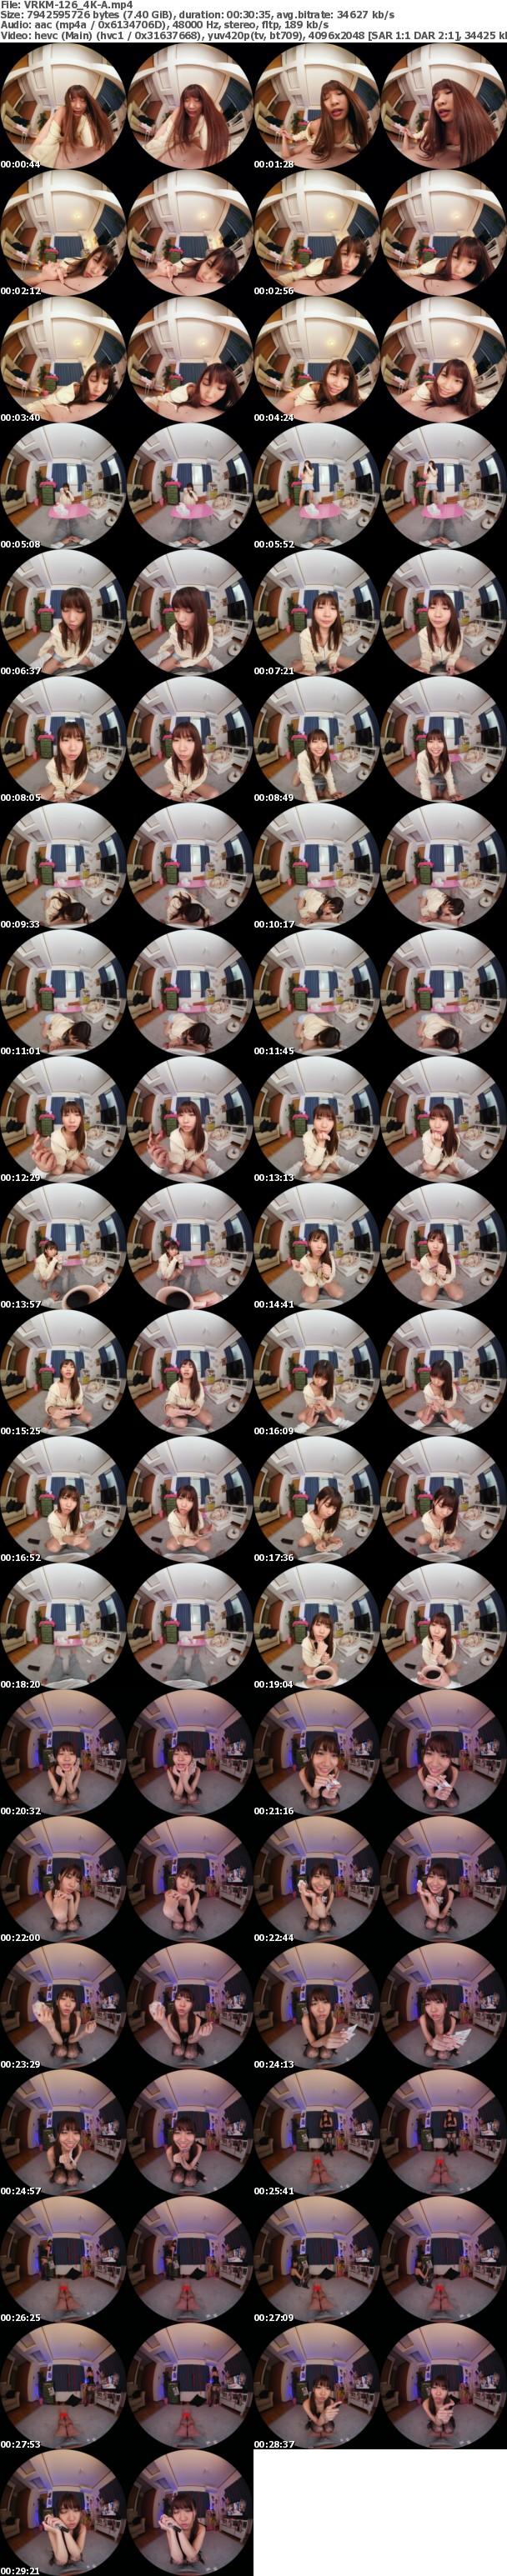 (VR) (4K) VRKM-126 Love×2 同棲生活だったのに…誘惑に負けた僕は彼女に絶対服従を余儀なくされる 樋口みつは